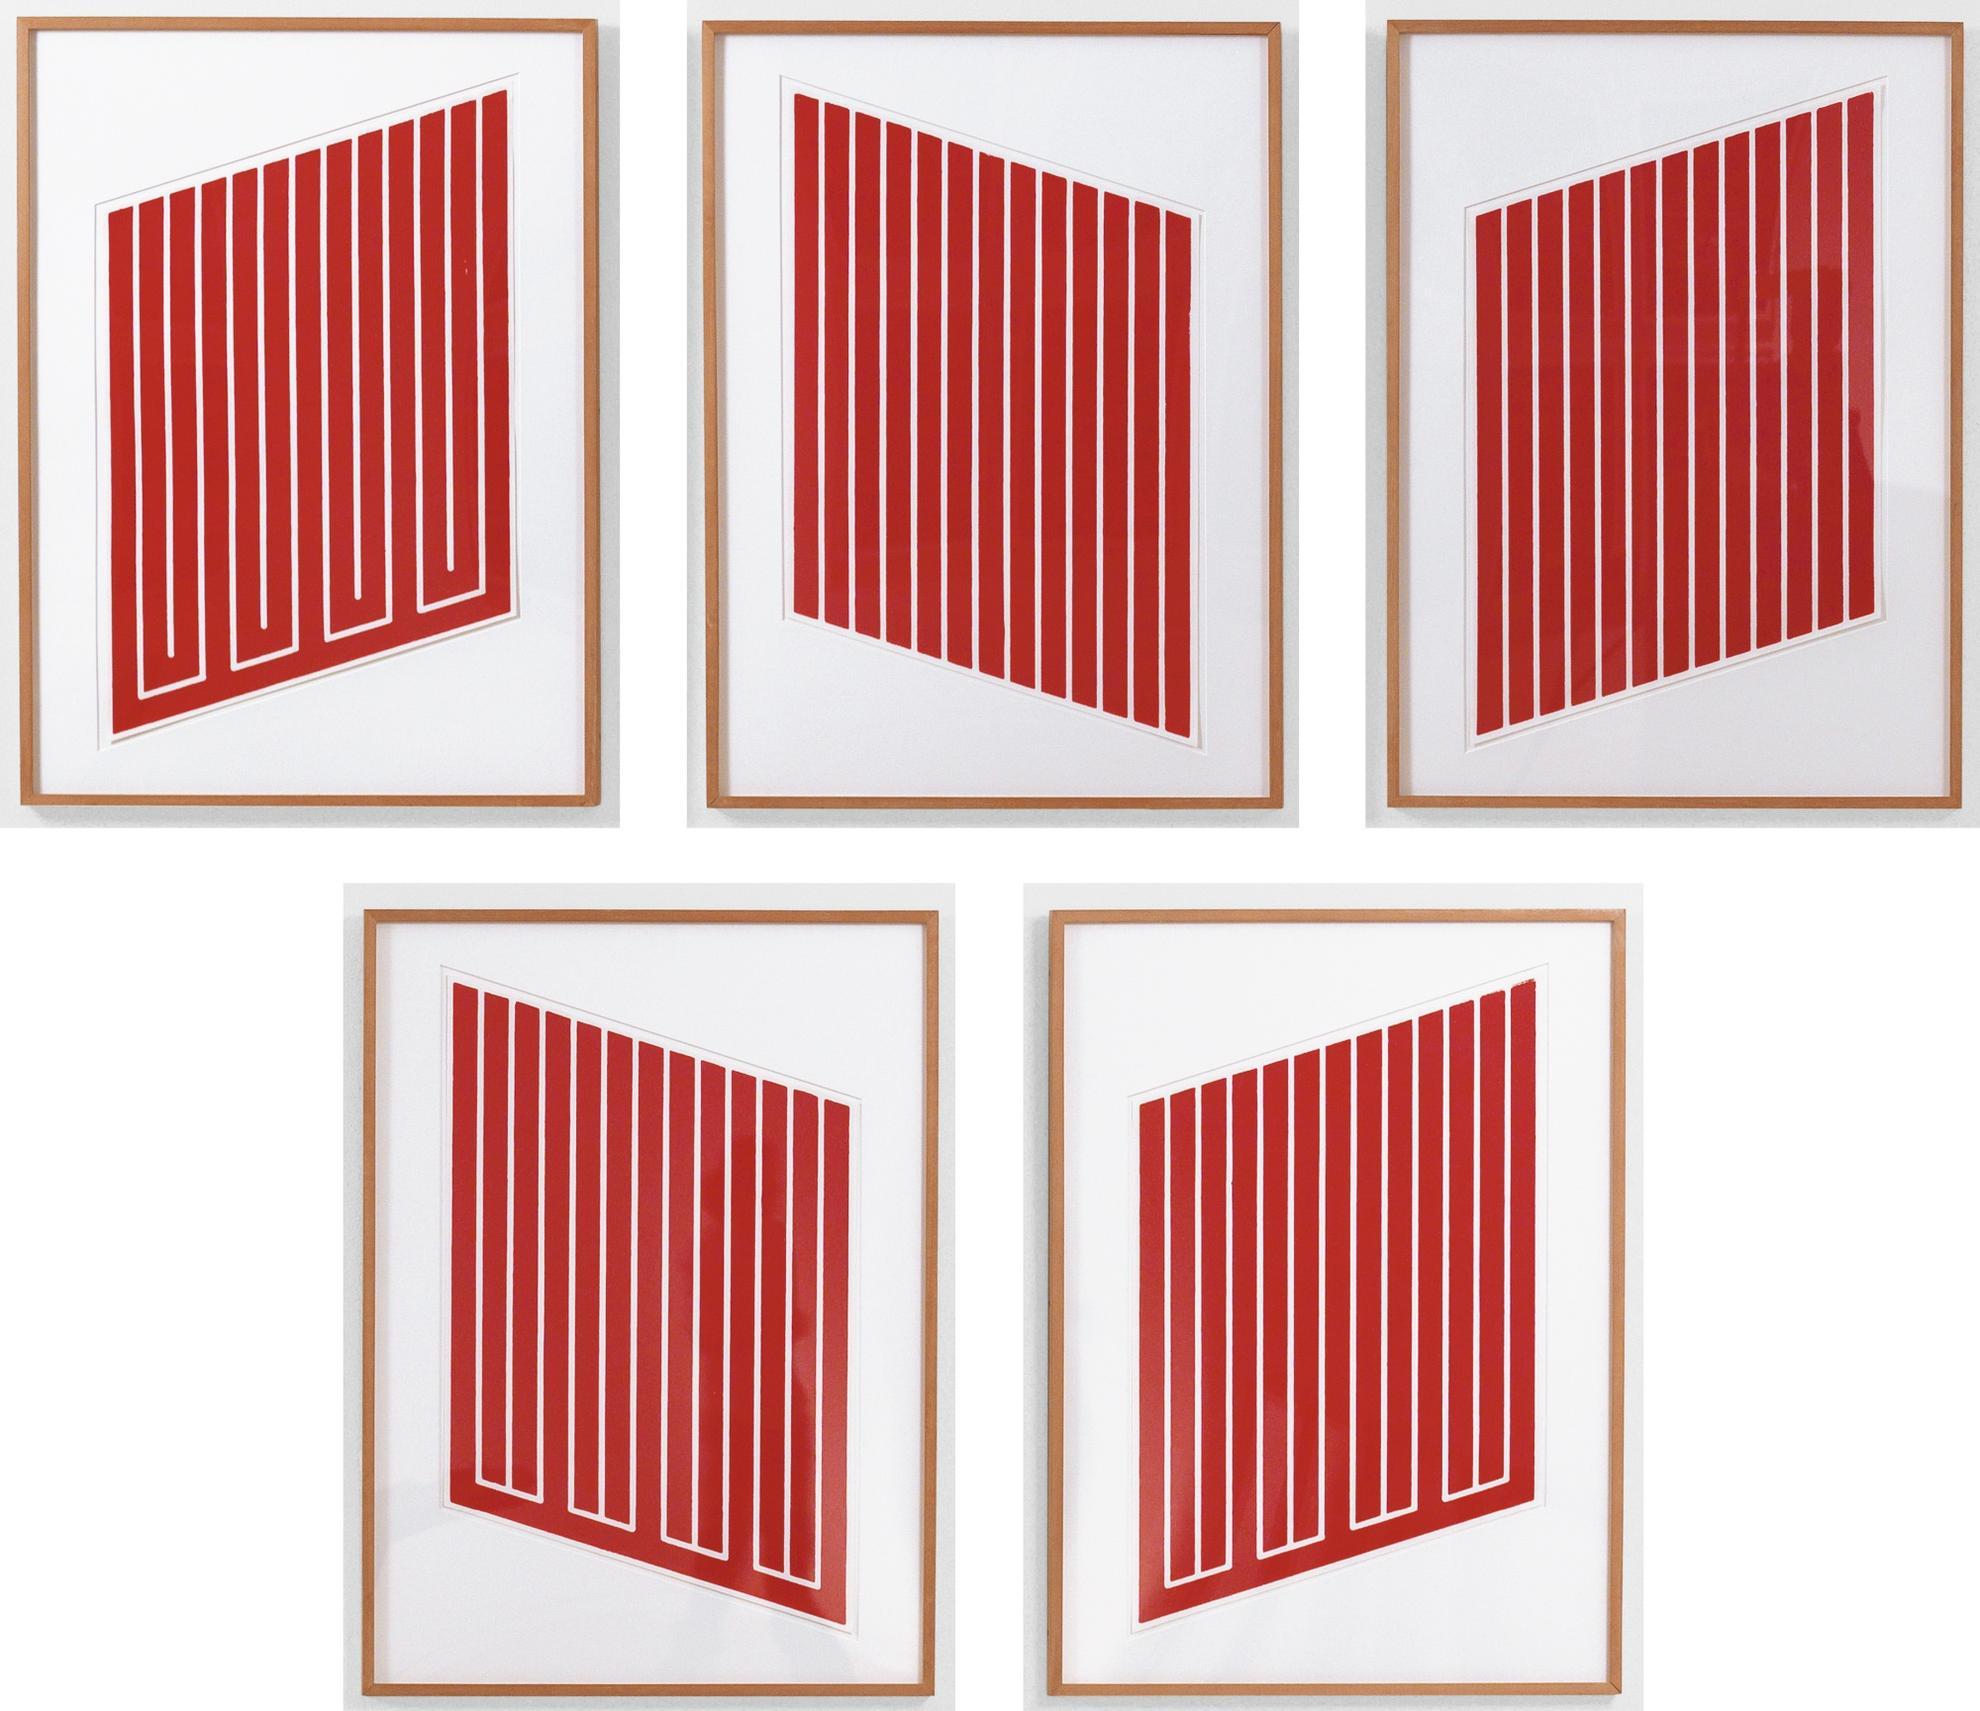 Donald Judd-Untitled: Five Prints (Schellmann 38, 41, 42, 61 & 62)-1969